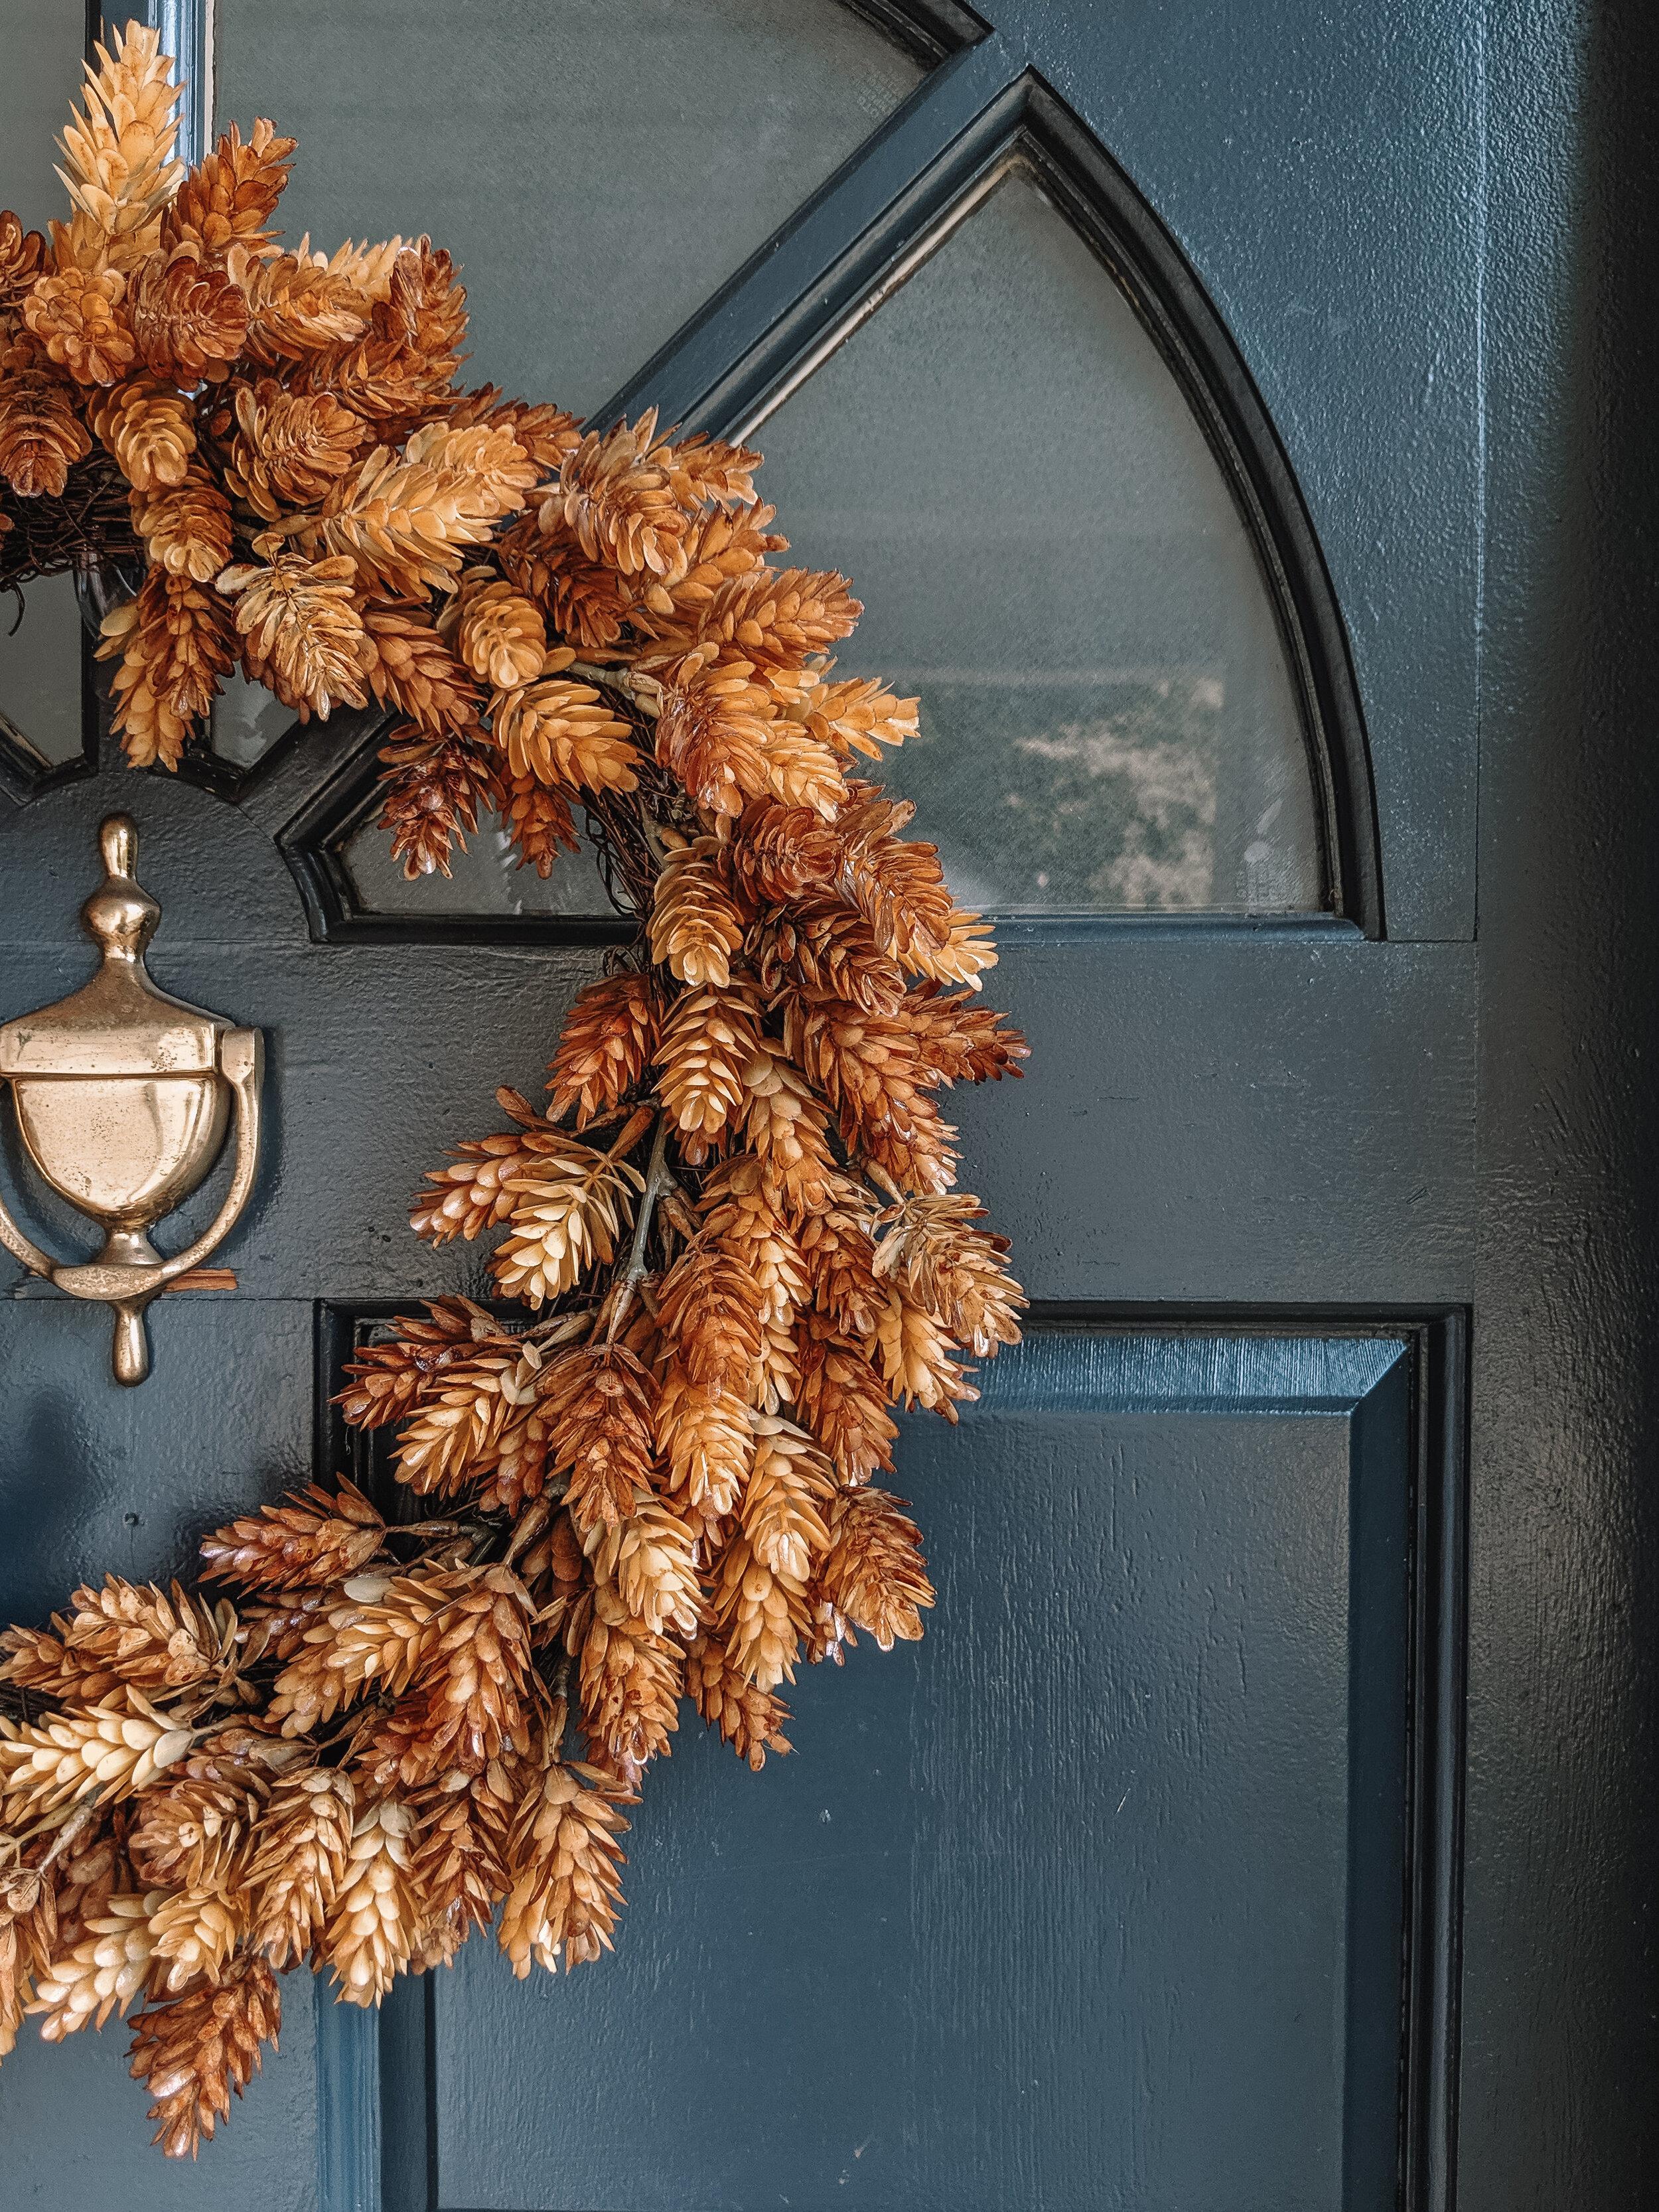 Fall Decor - Wreath